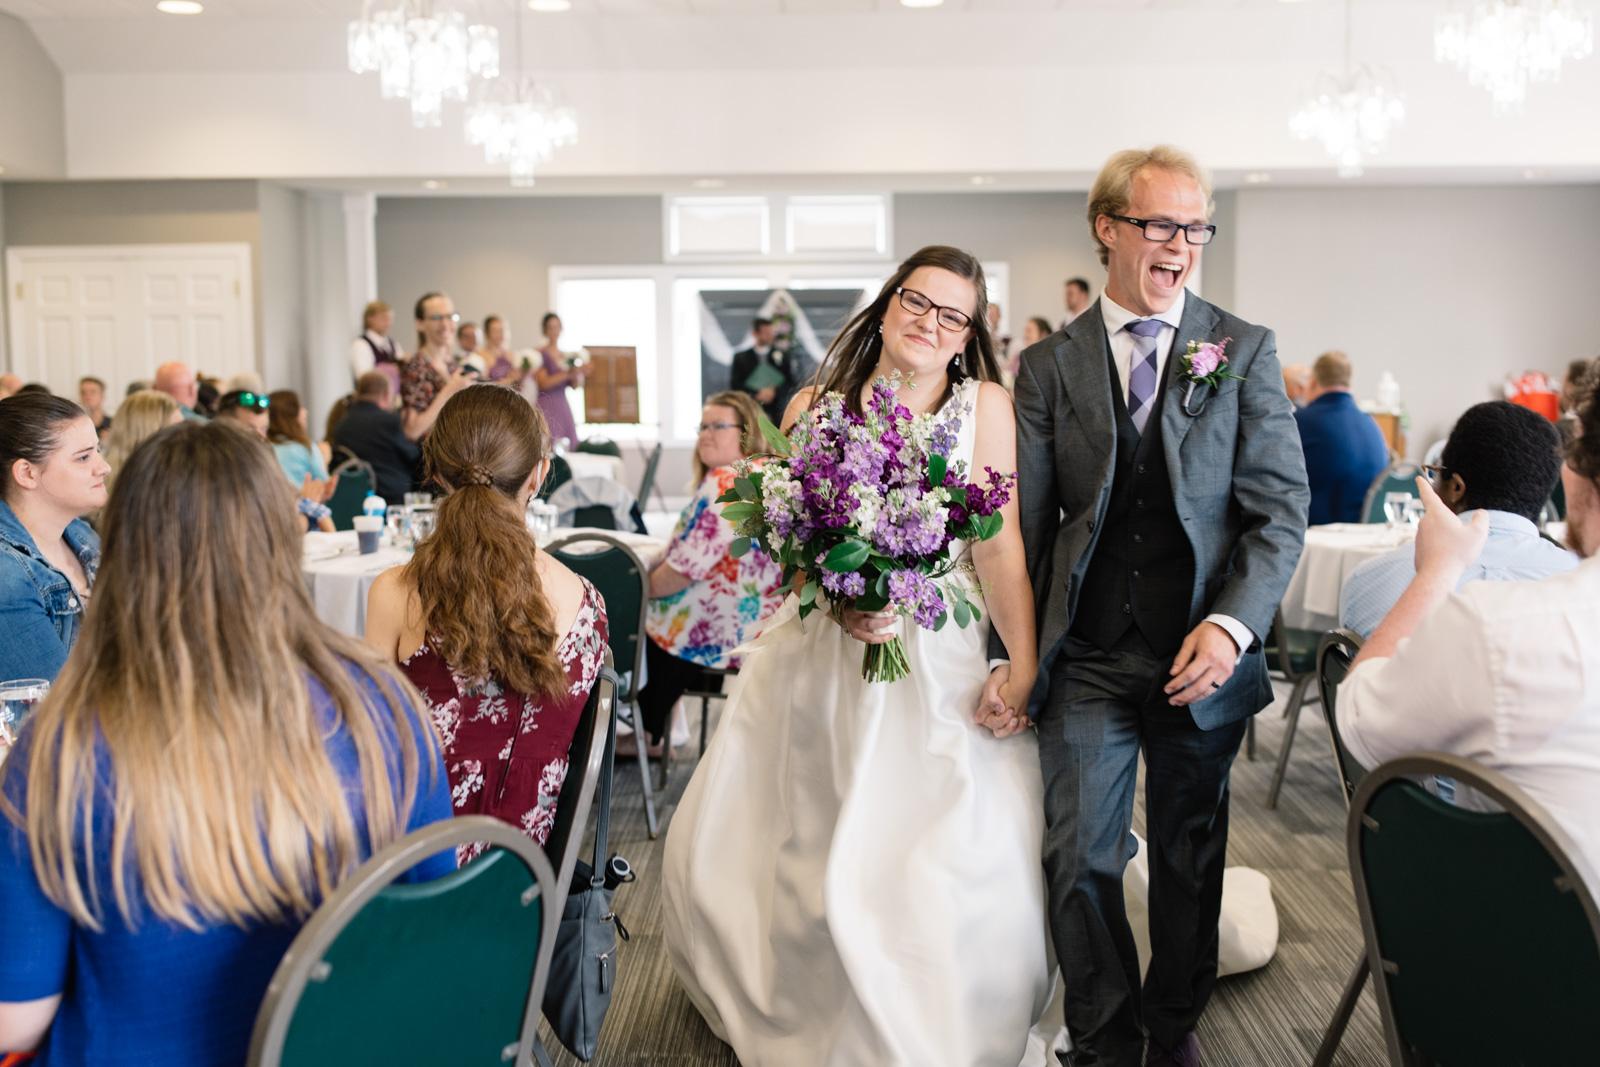 bride and groom walking down the aisle fox ridge golf course wedding venue